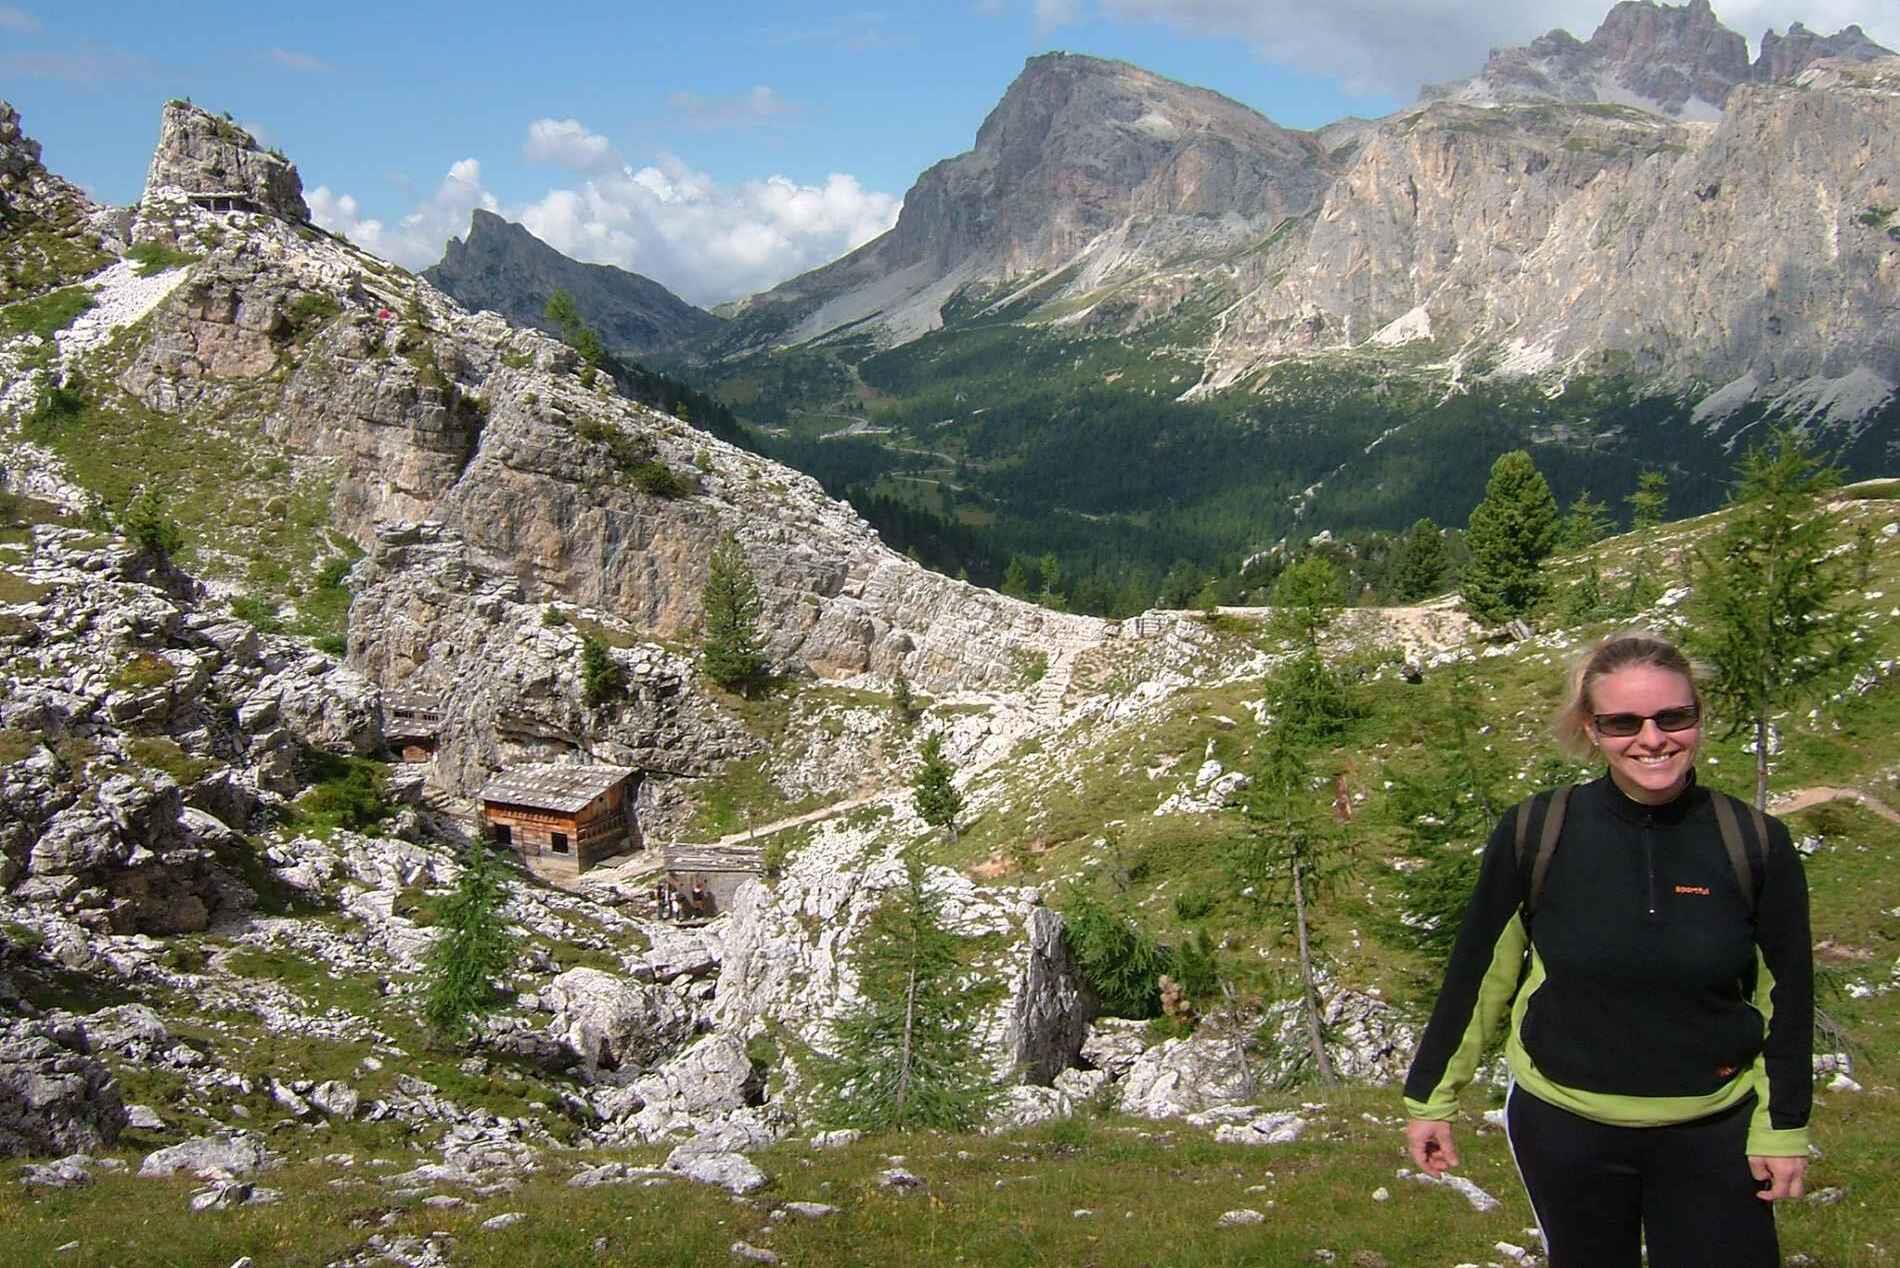 Guida turistica Valentina Pilotti